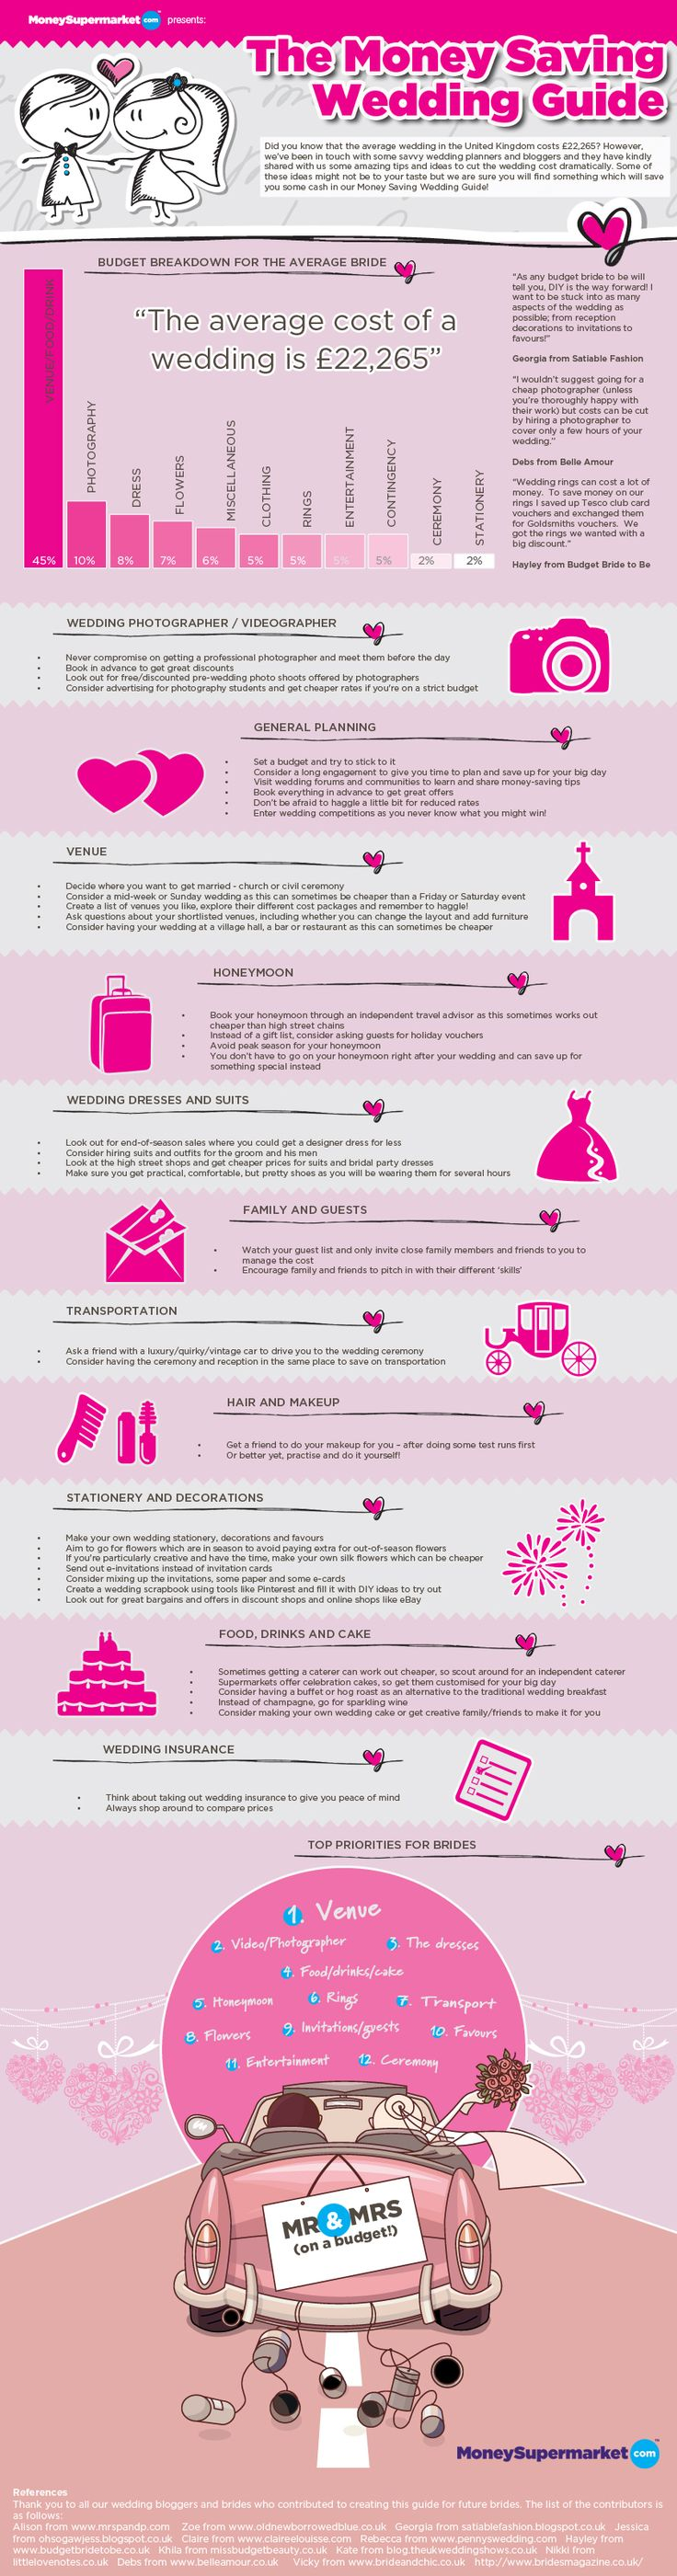 The Money Saving Wedding Guide - Infographic by MoneySupermarket